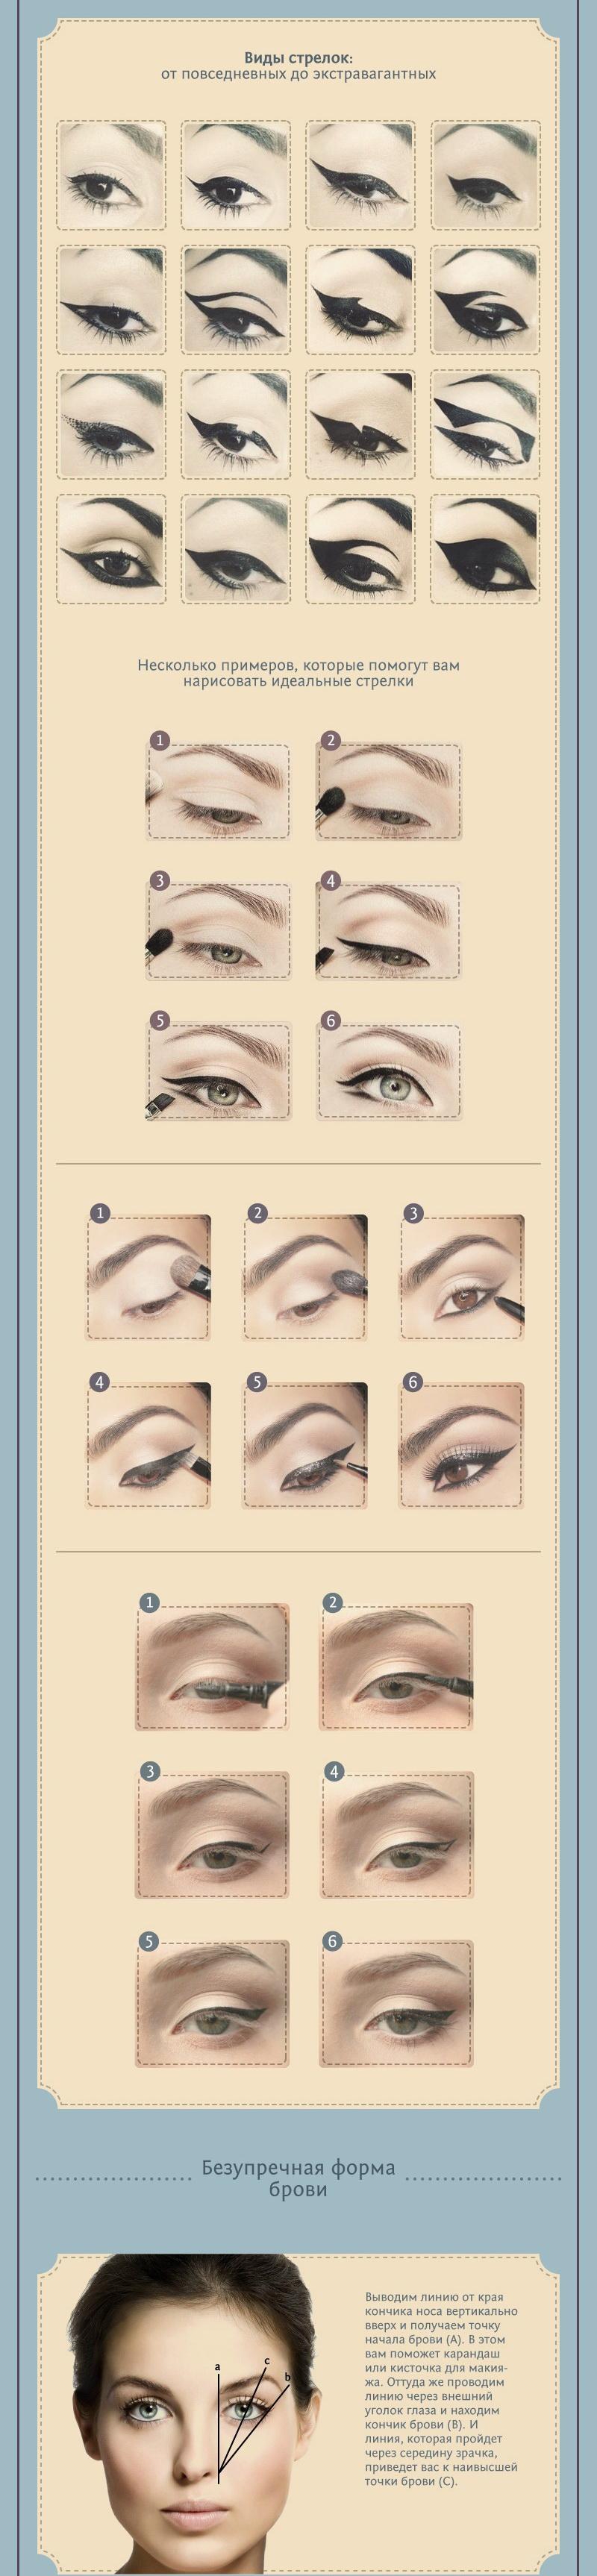 Виды и типы макияжа